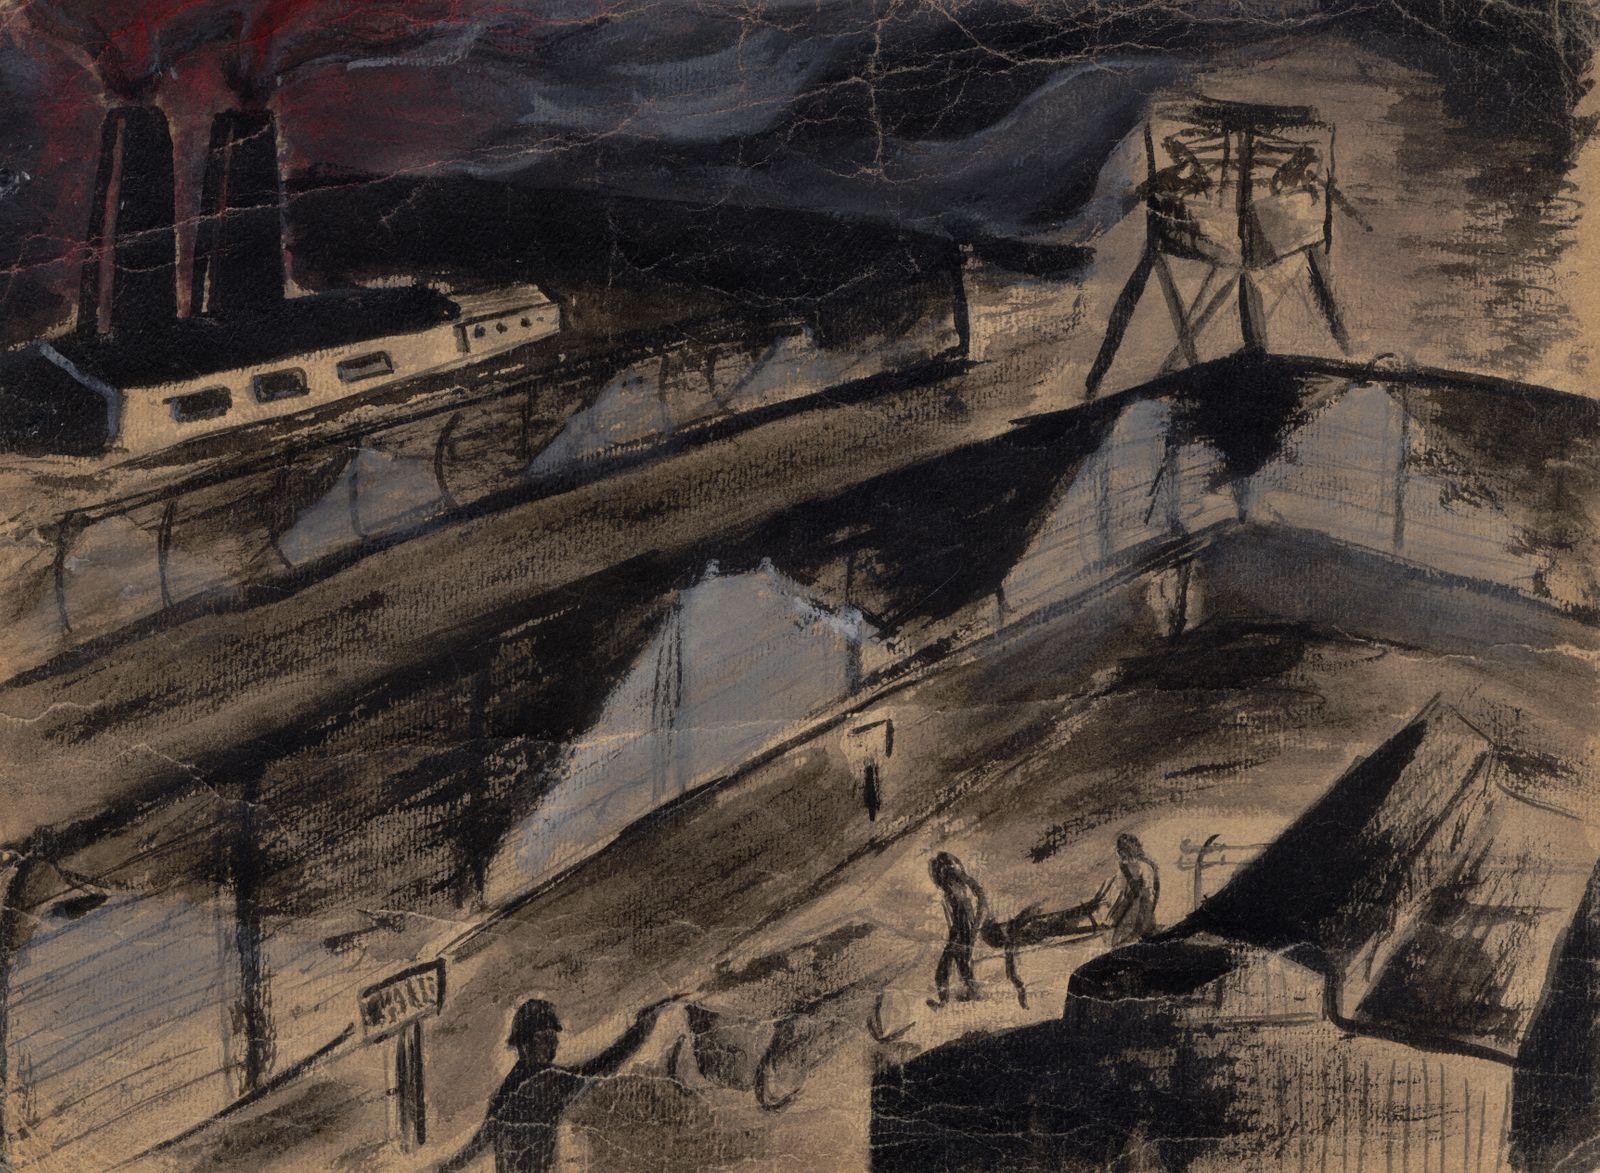 Yehuda Bacon - Auschwitz, ca. 1947